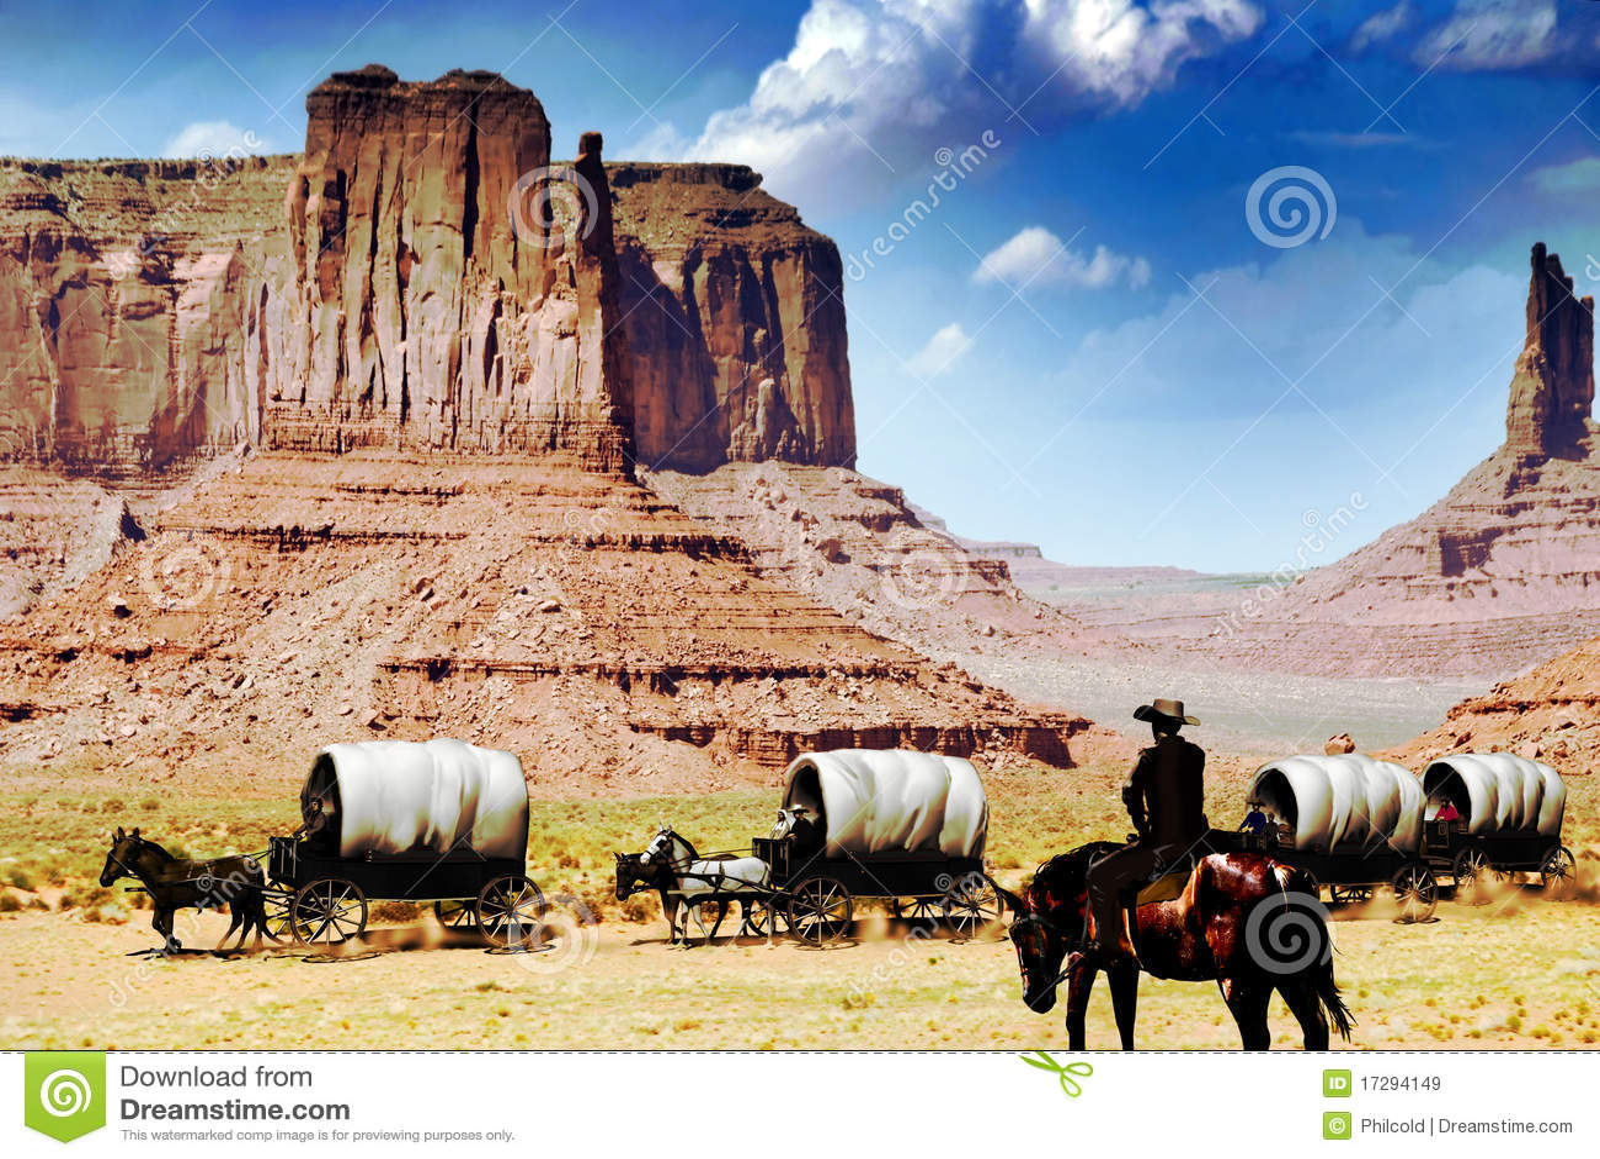 Wagon Train Royalty Free Stock Images Image 17294149